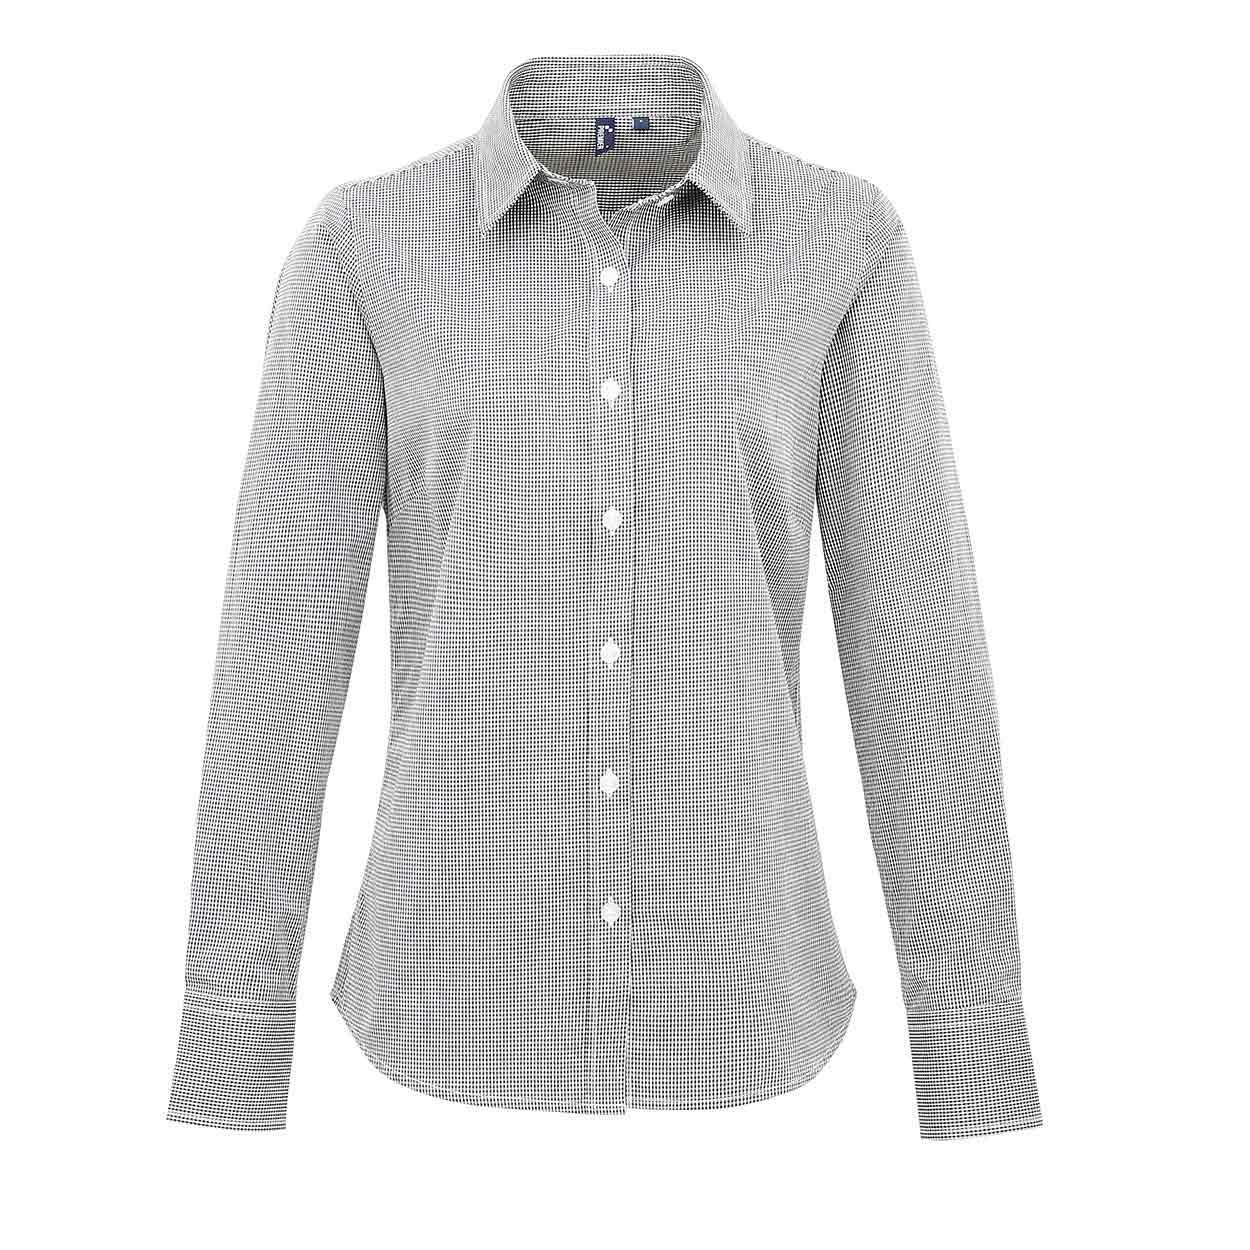 ... cotton shirt. Zoom · Premier PR320 Women s Microcheck (Gingham) long sl  ... cc6b36b9b94